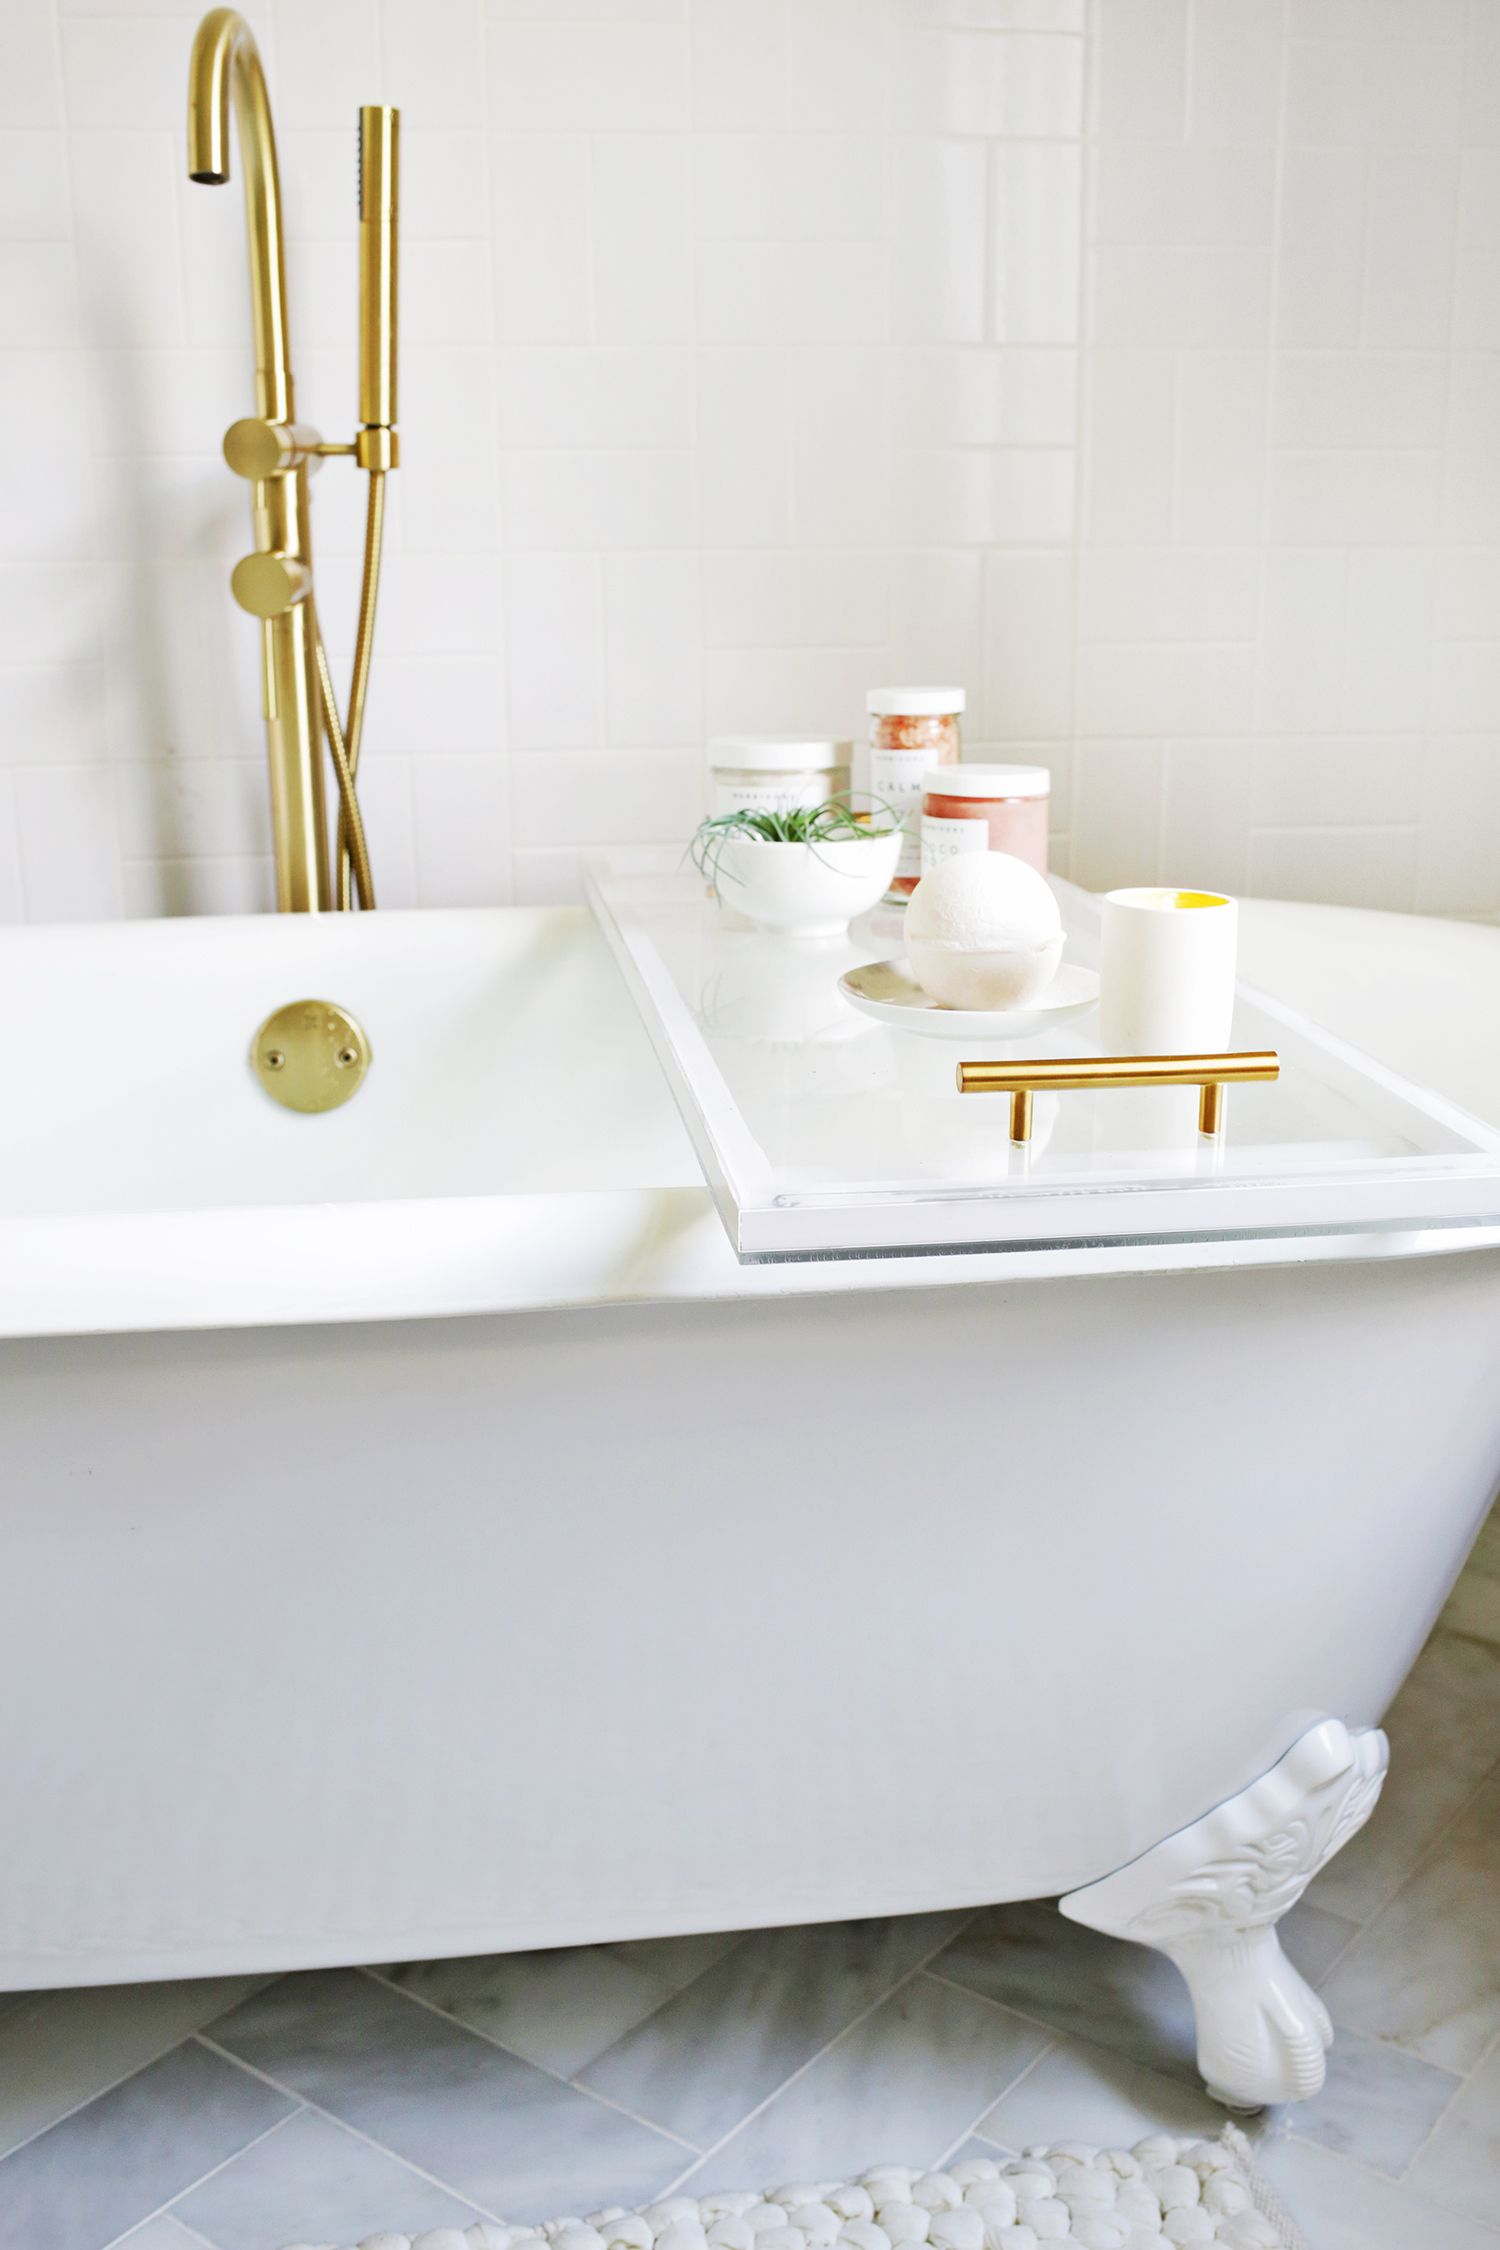 Lucite bathtub caddy diy click through for more bathe prep